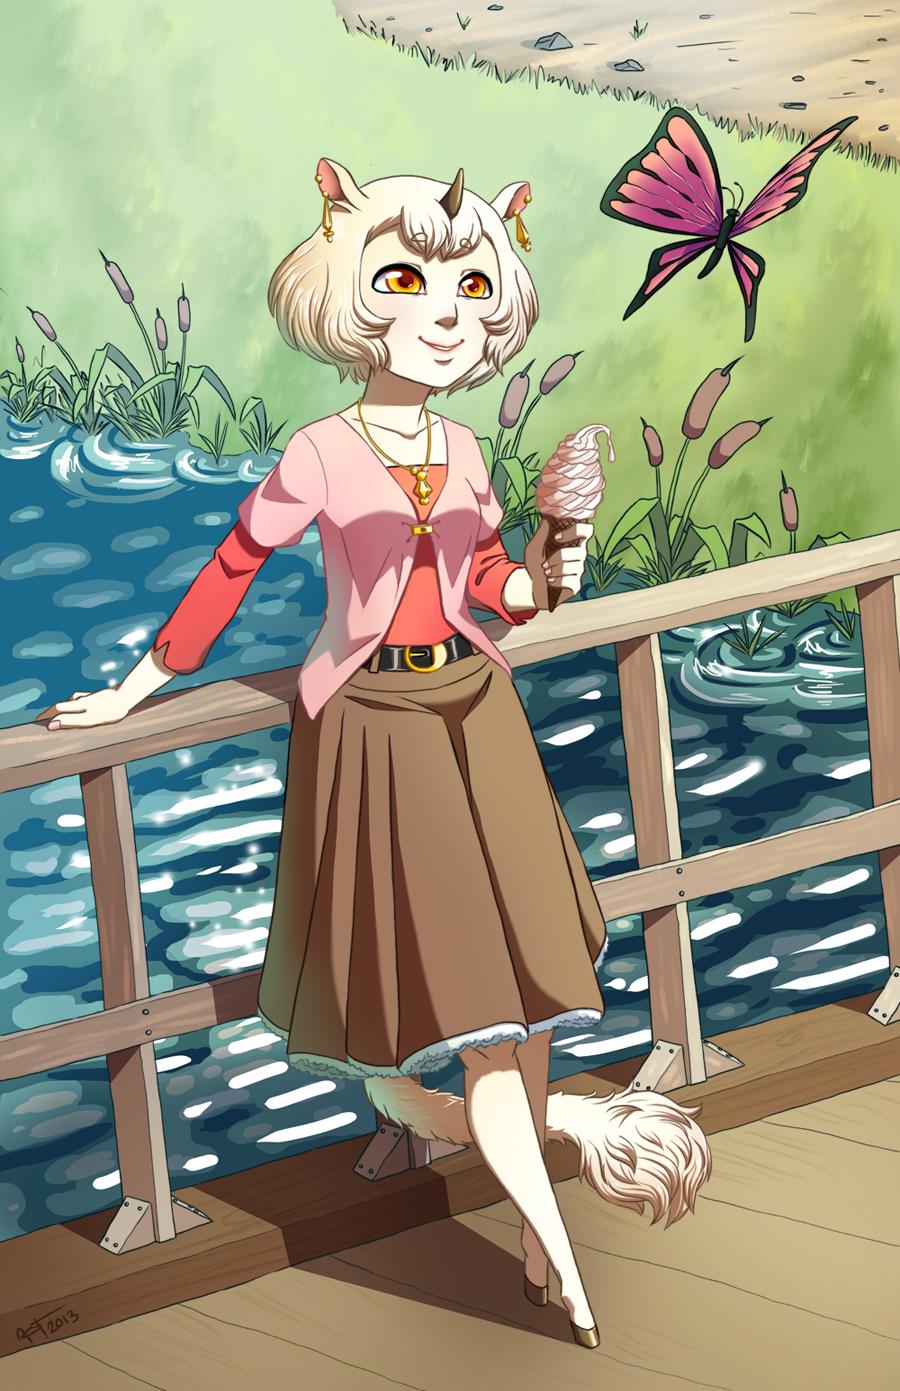 Vanilla in the park